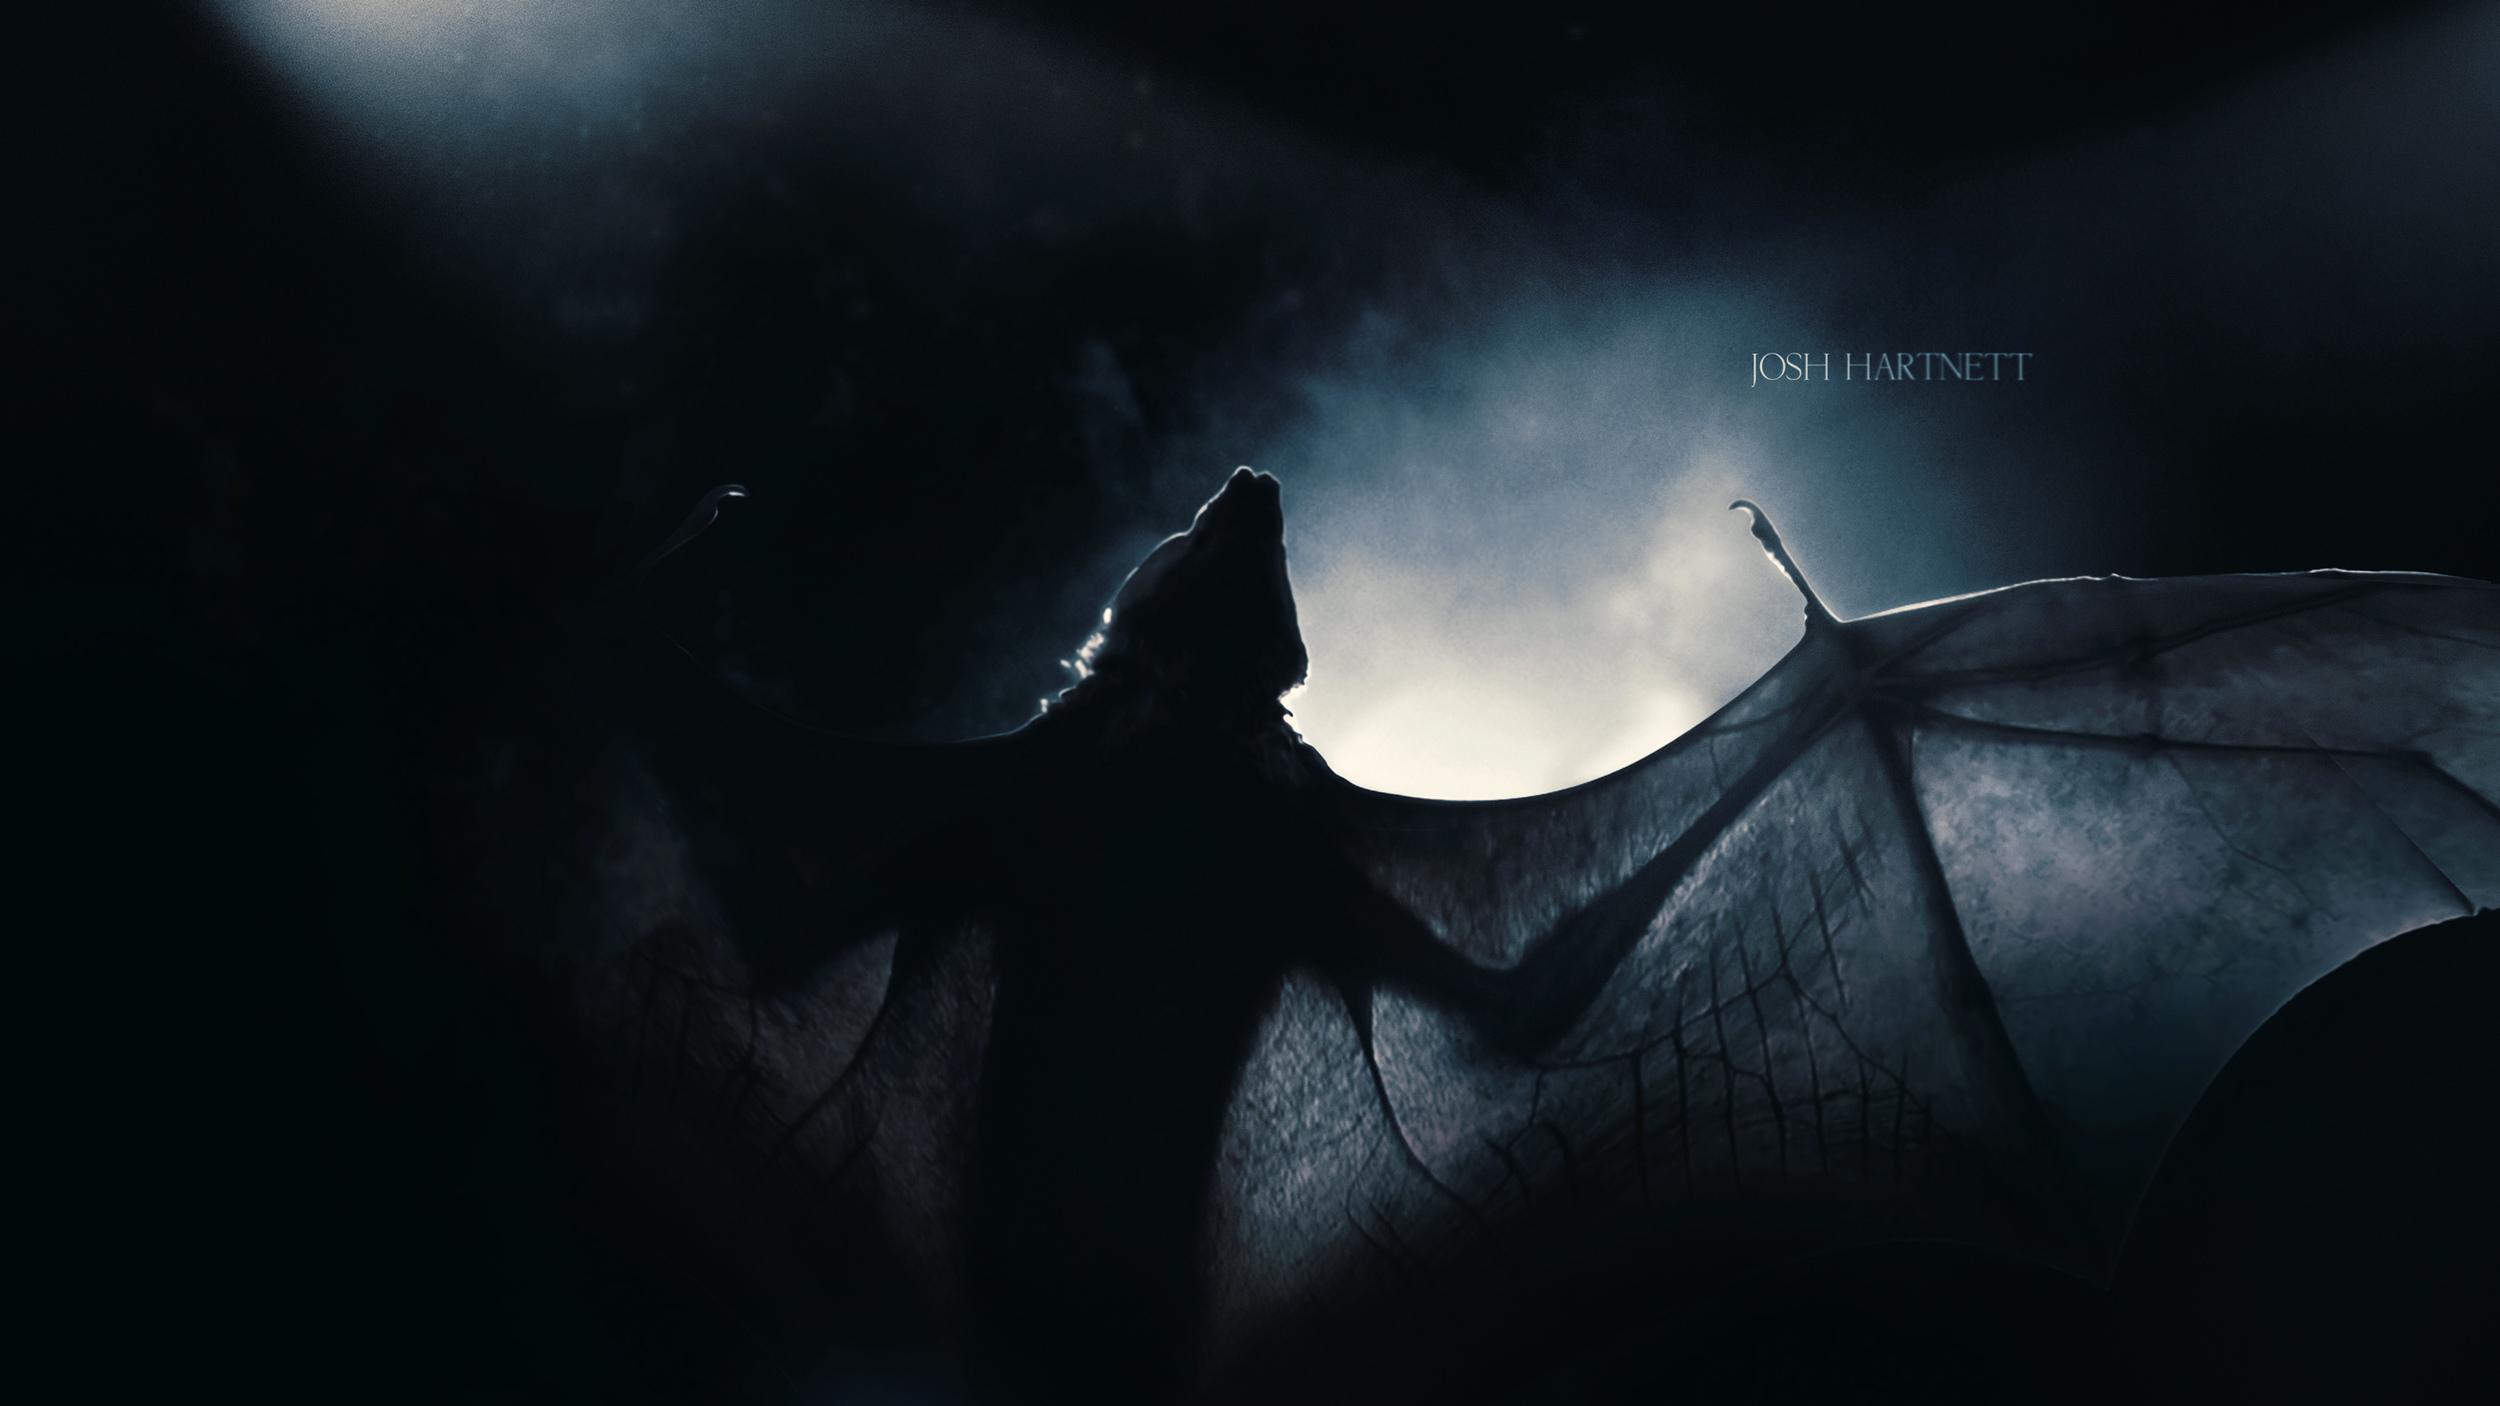 Lauren-Indovina-Penny-Dreadful-Titles-PSYOP-Concept-Art-Dracula.jpg